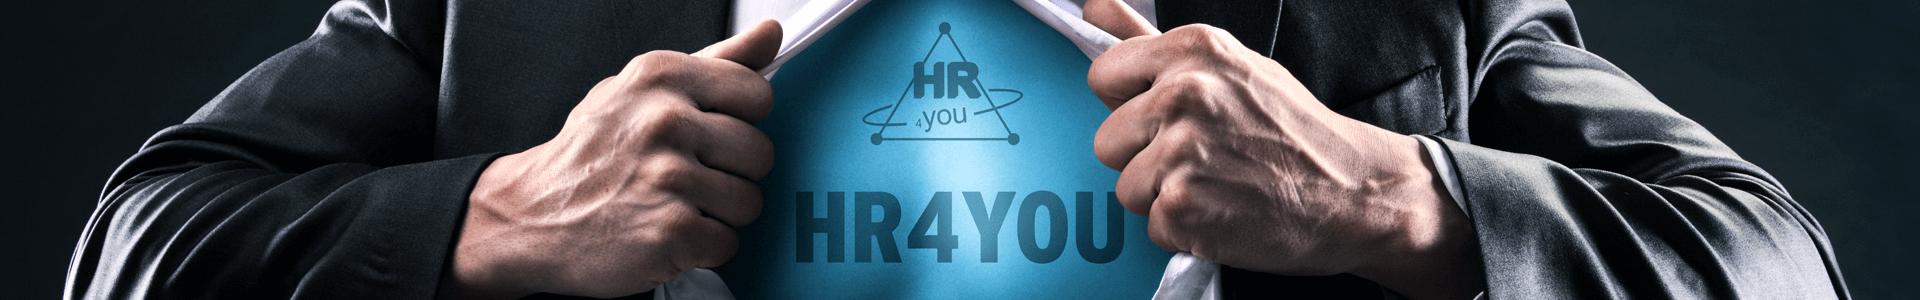 hr4you digitale personalakte hcm